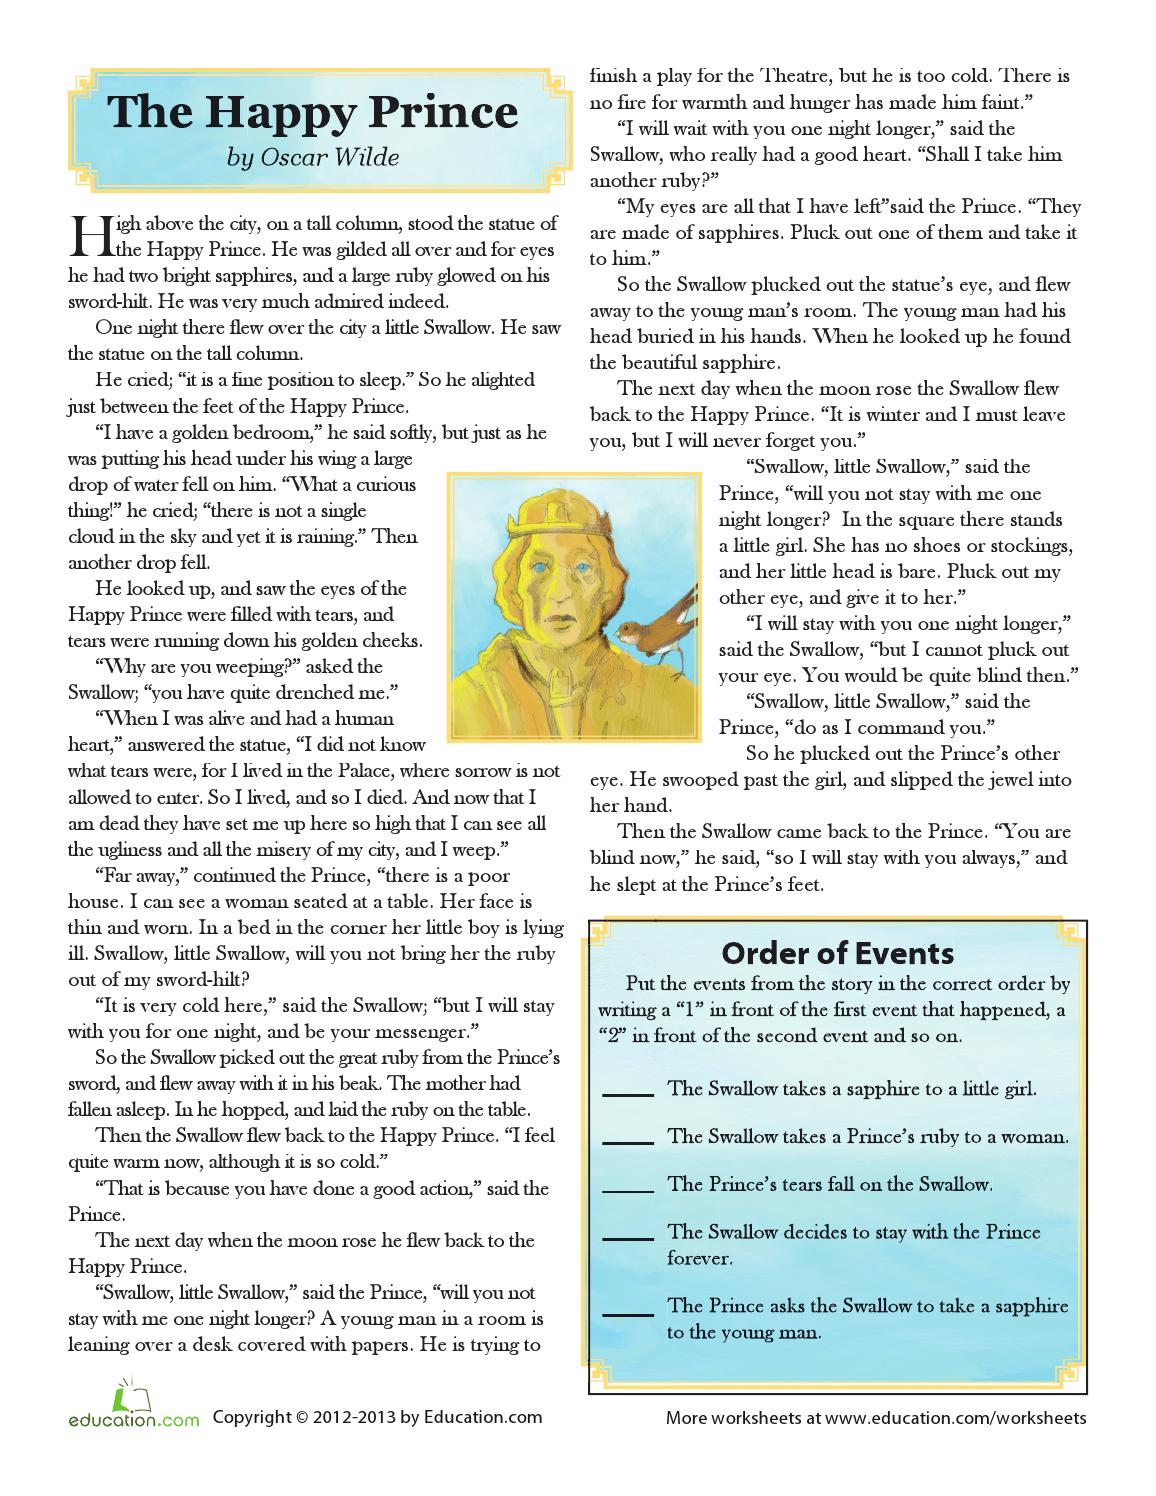 The happy prince worksheet by Gemma - issuu